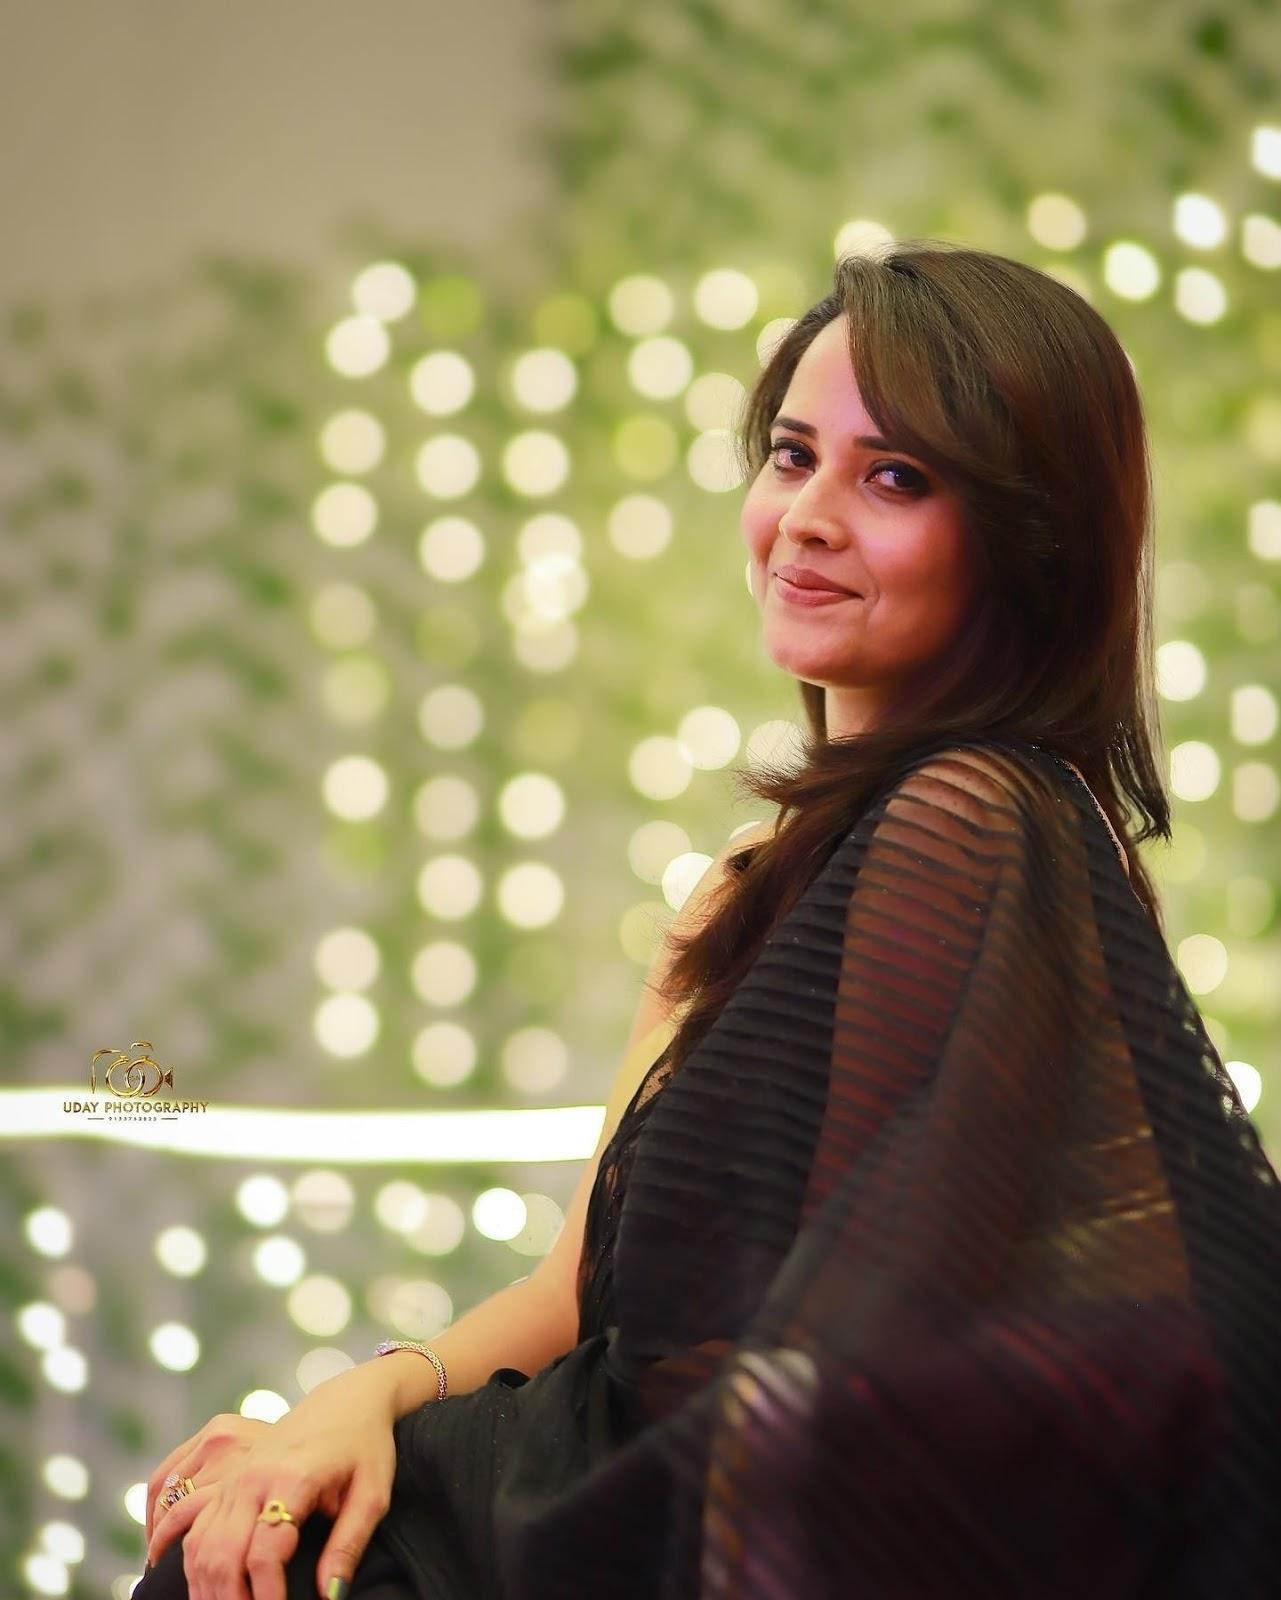 Archana gupta south actress CTS2 11 hot sari pic